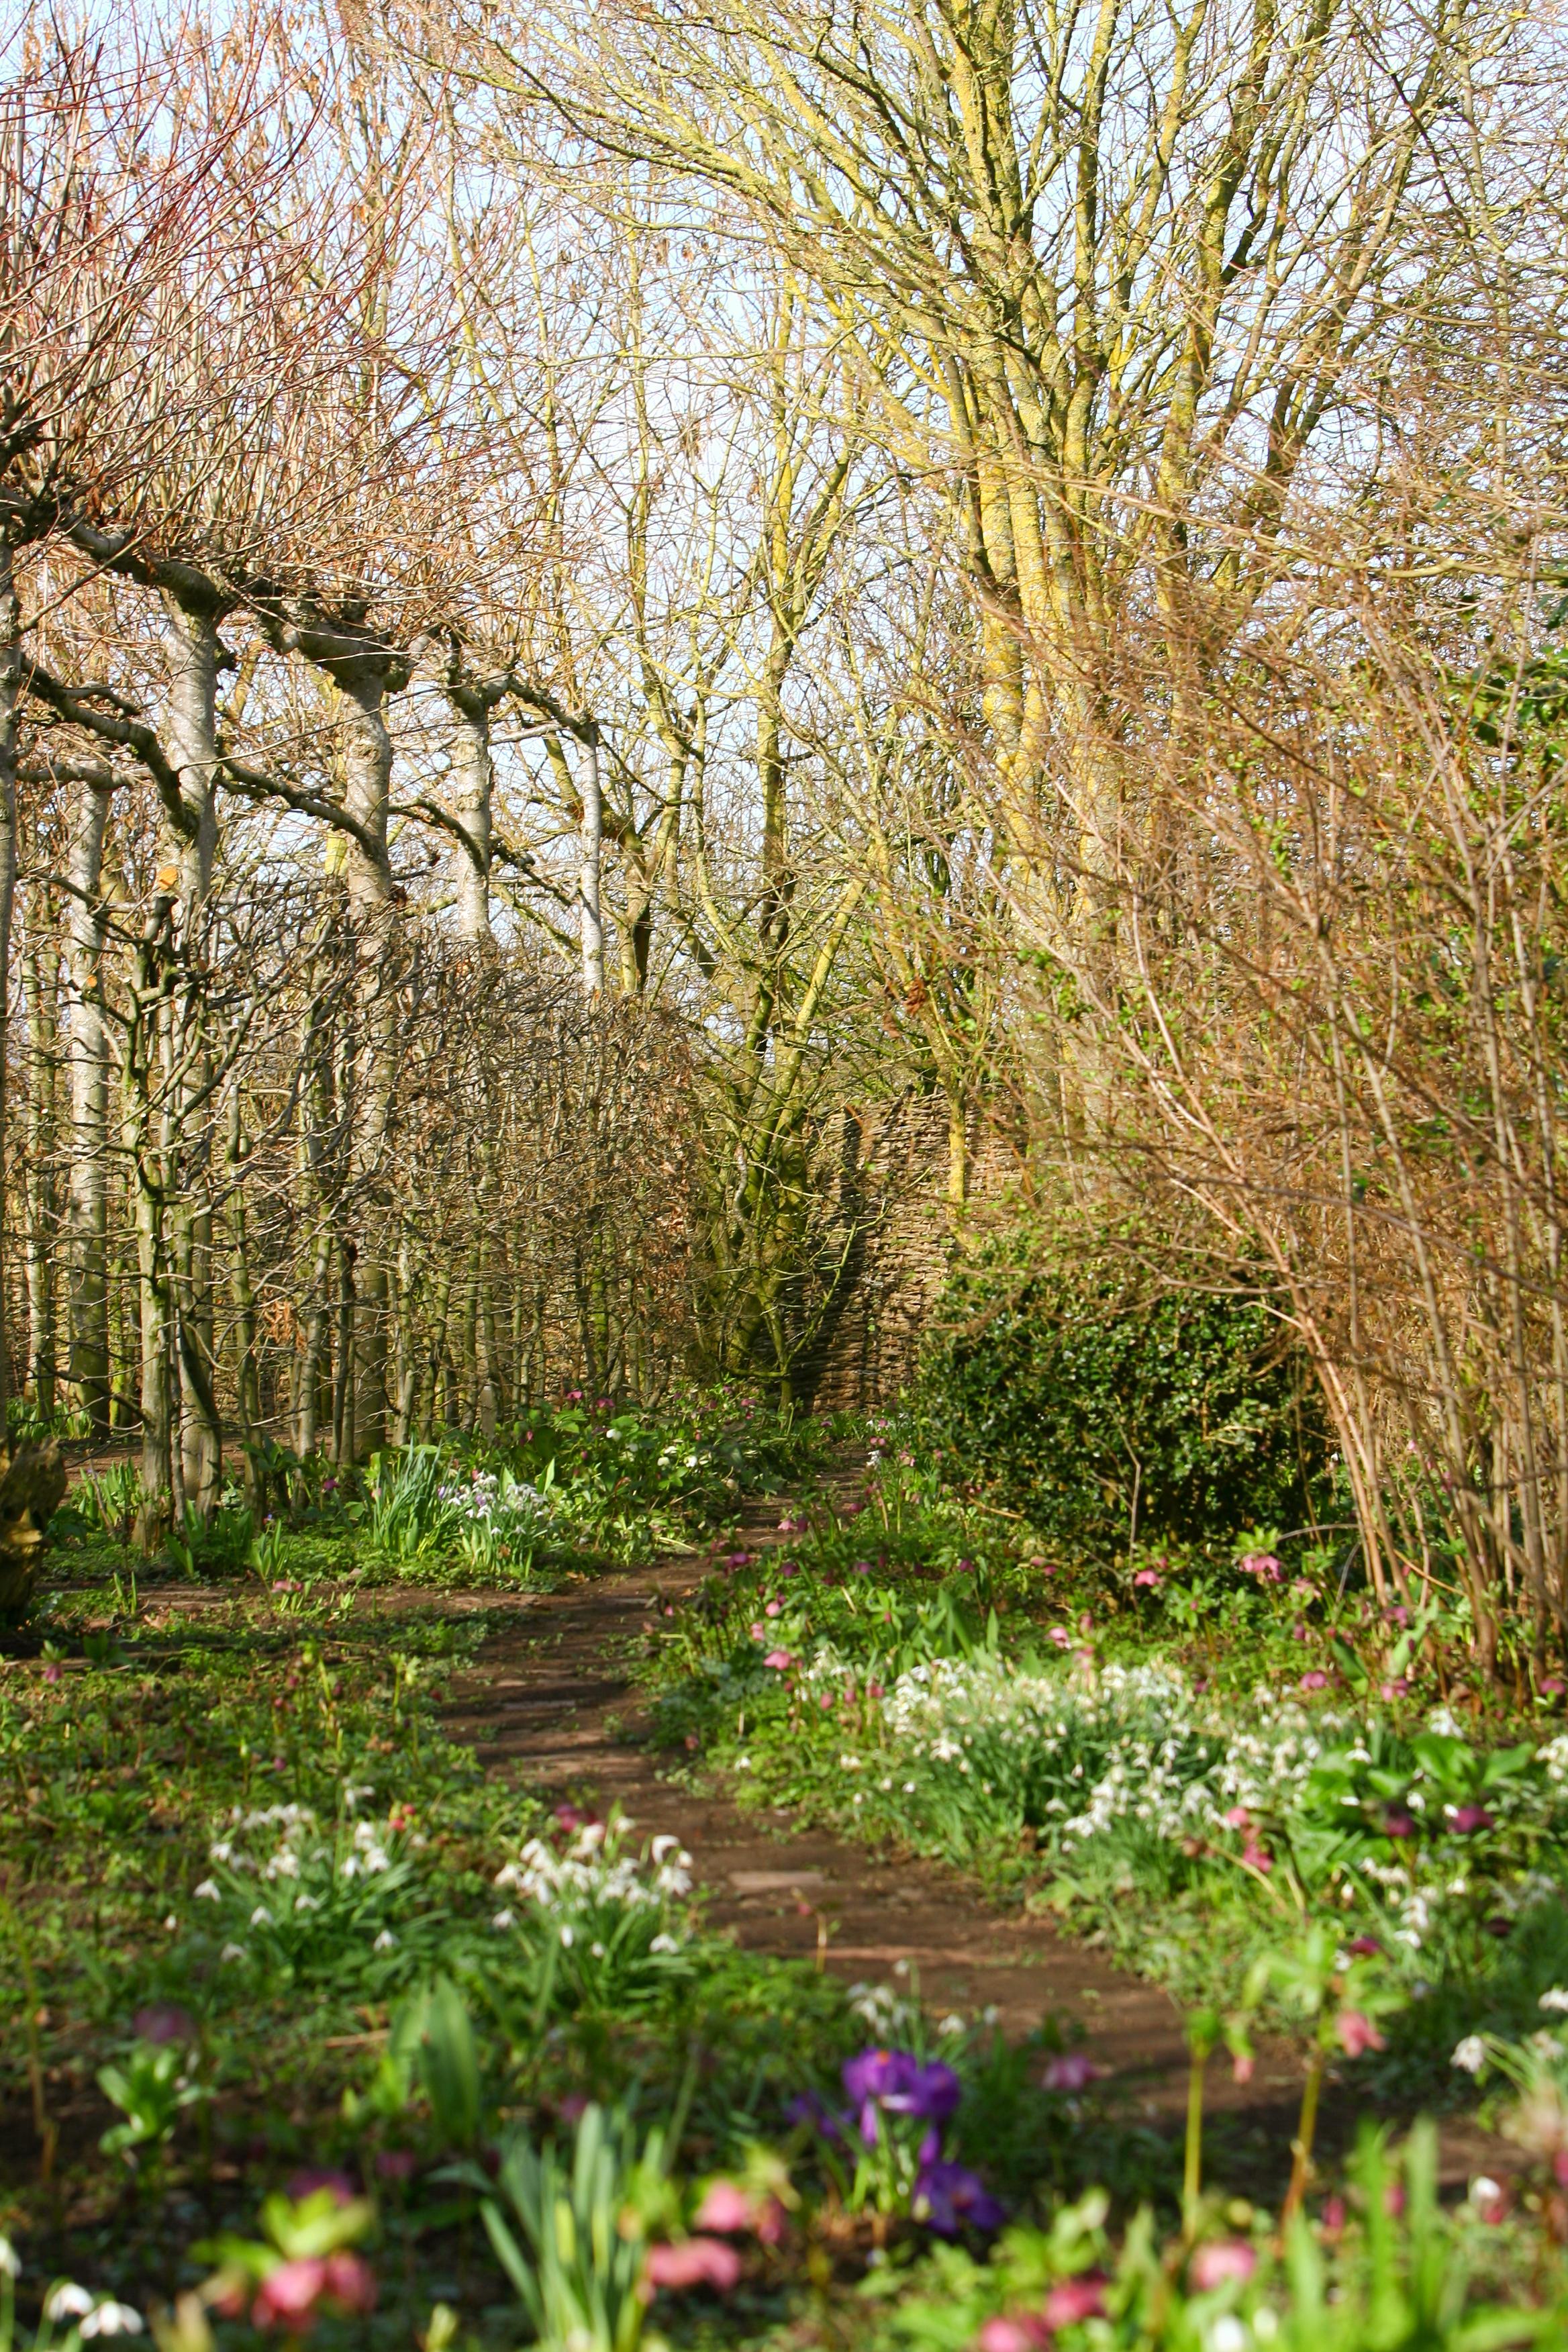 spring_garden24_Feb_2011_Feb_24_2011_1063.jpg